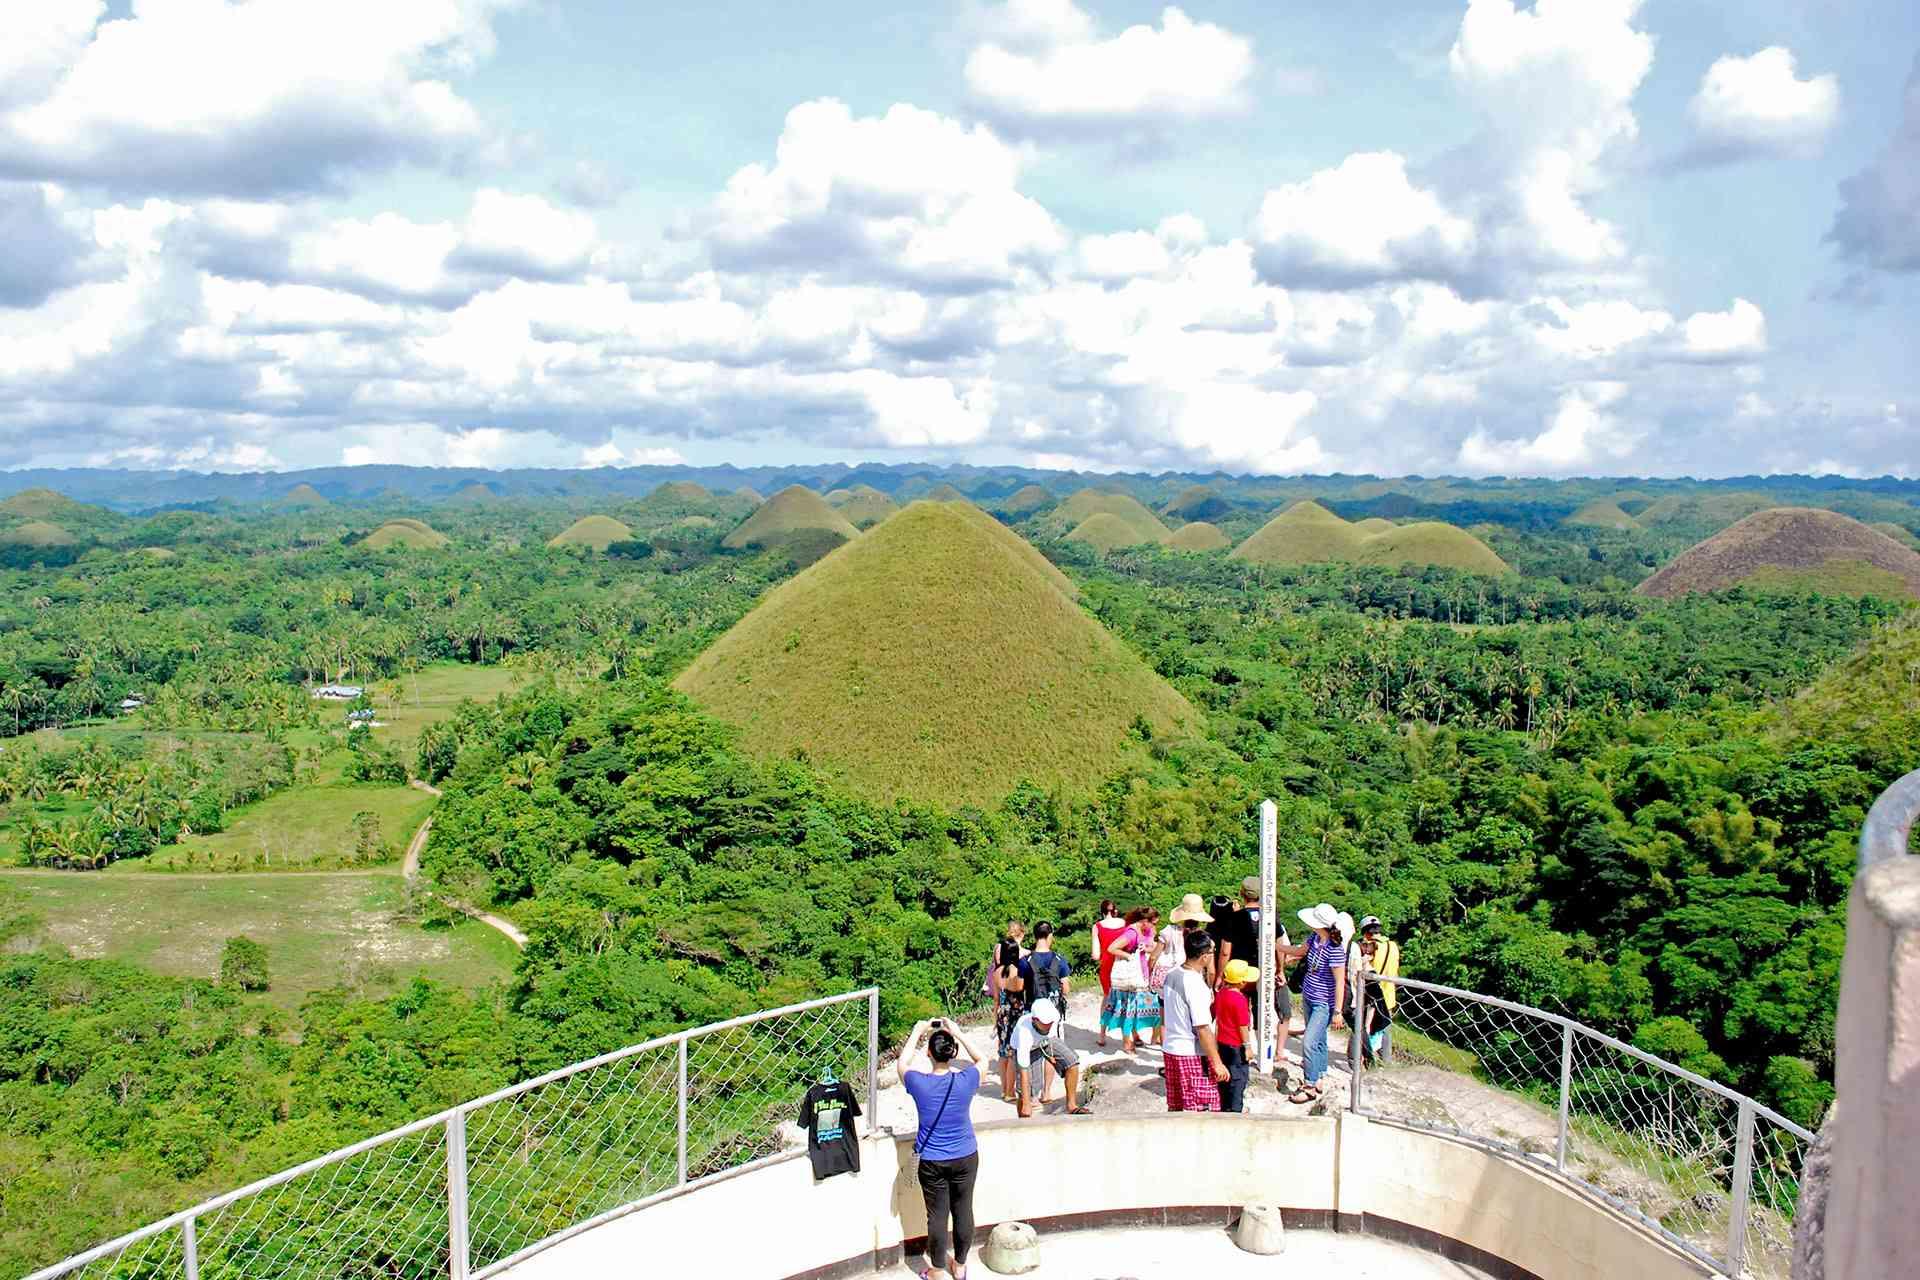 Chocolate Hills Viewdeck, Bohol, Philippines